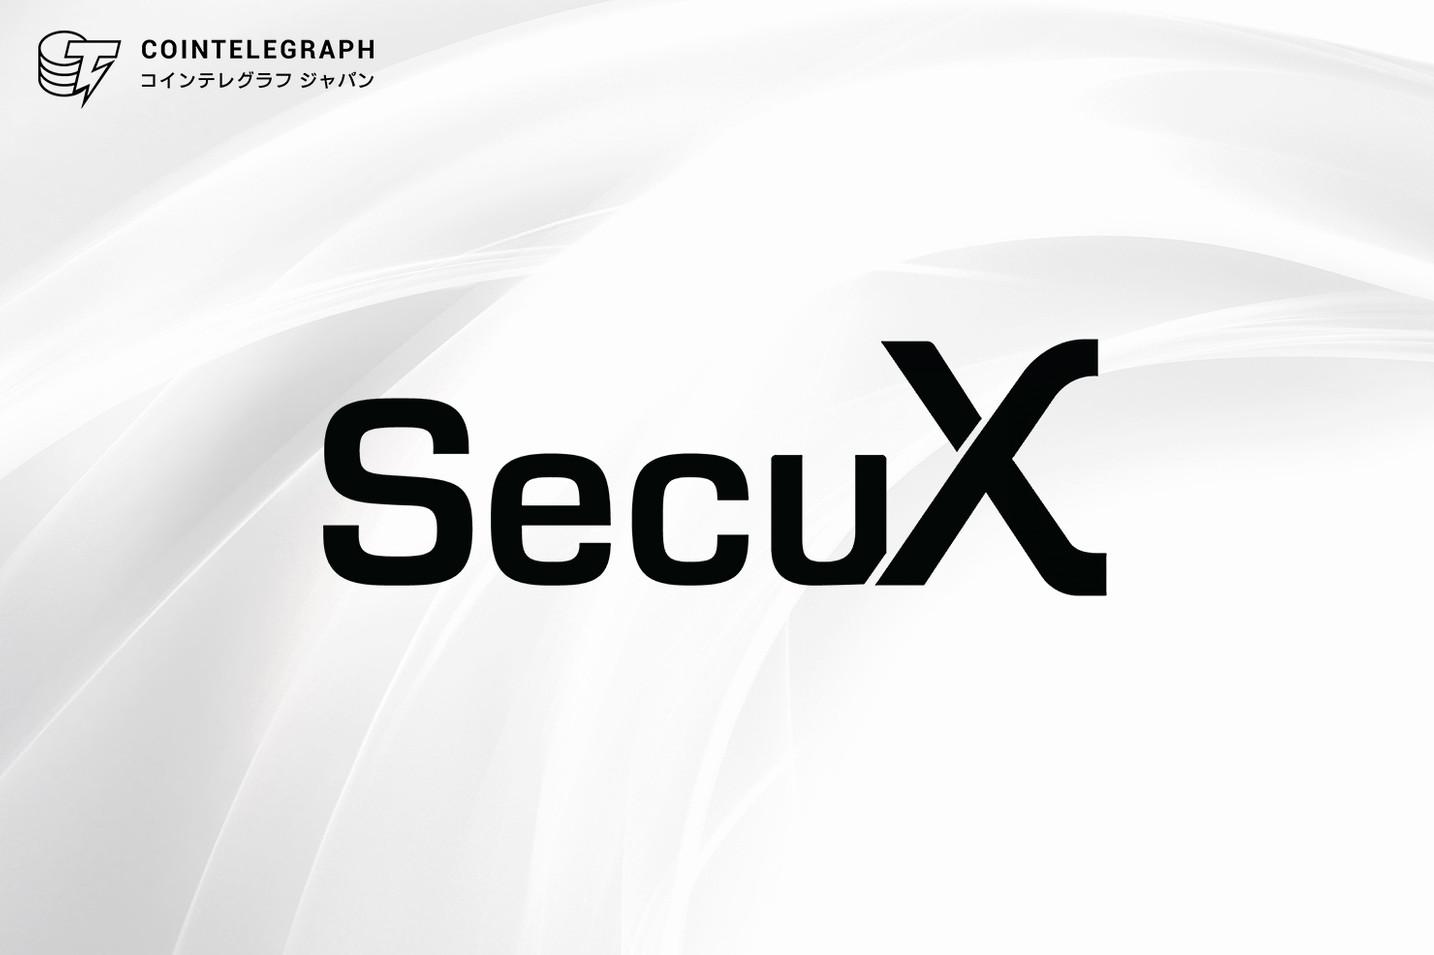 SecuXが暗号通貨用モバイル決済ツールを公開 Amazon.co.jpで販売中